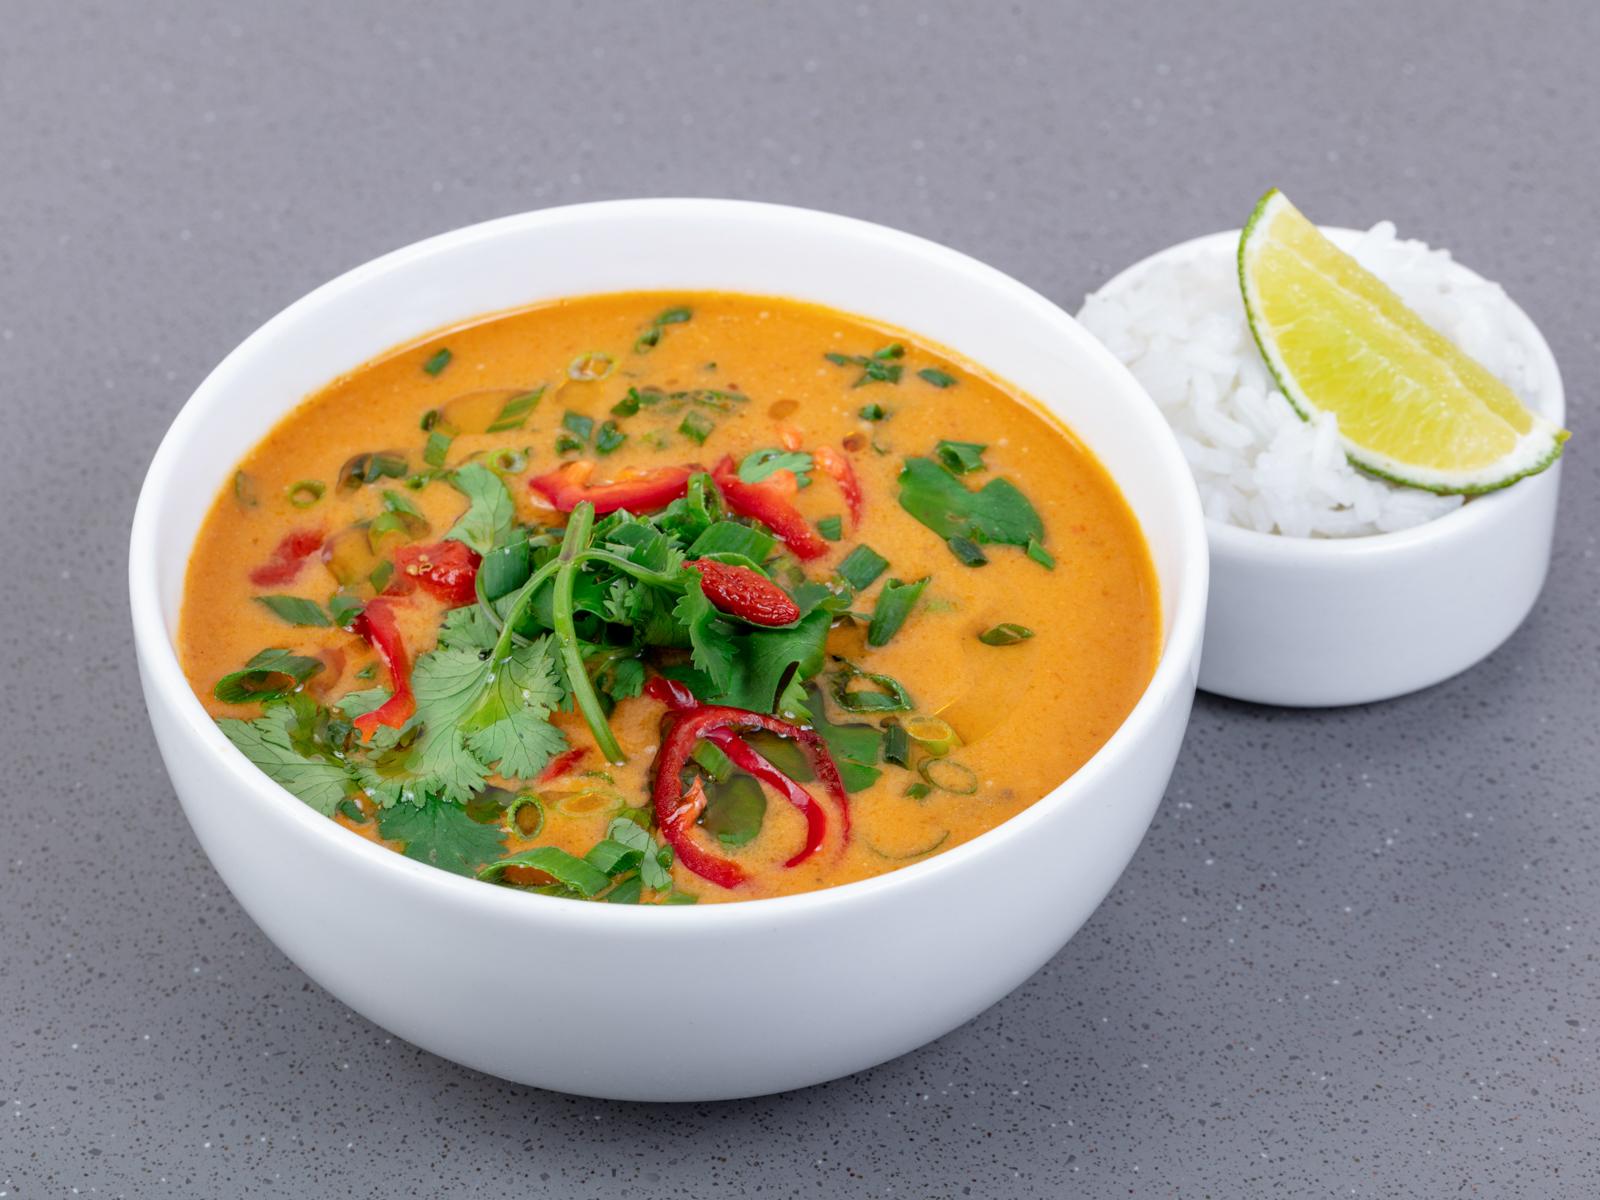 Суп Том-ям с креветками, вешенками и филе трески